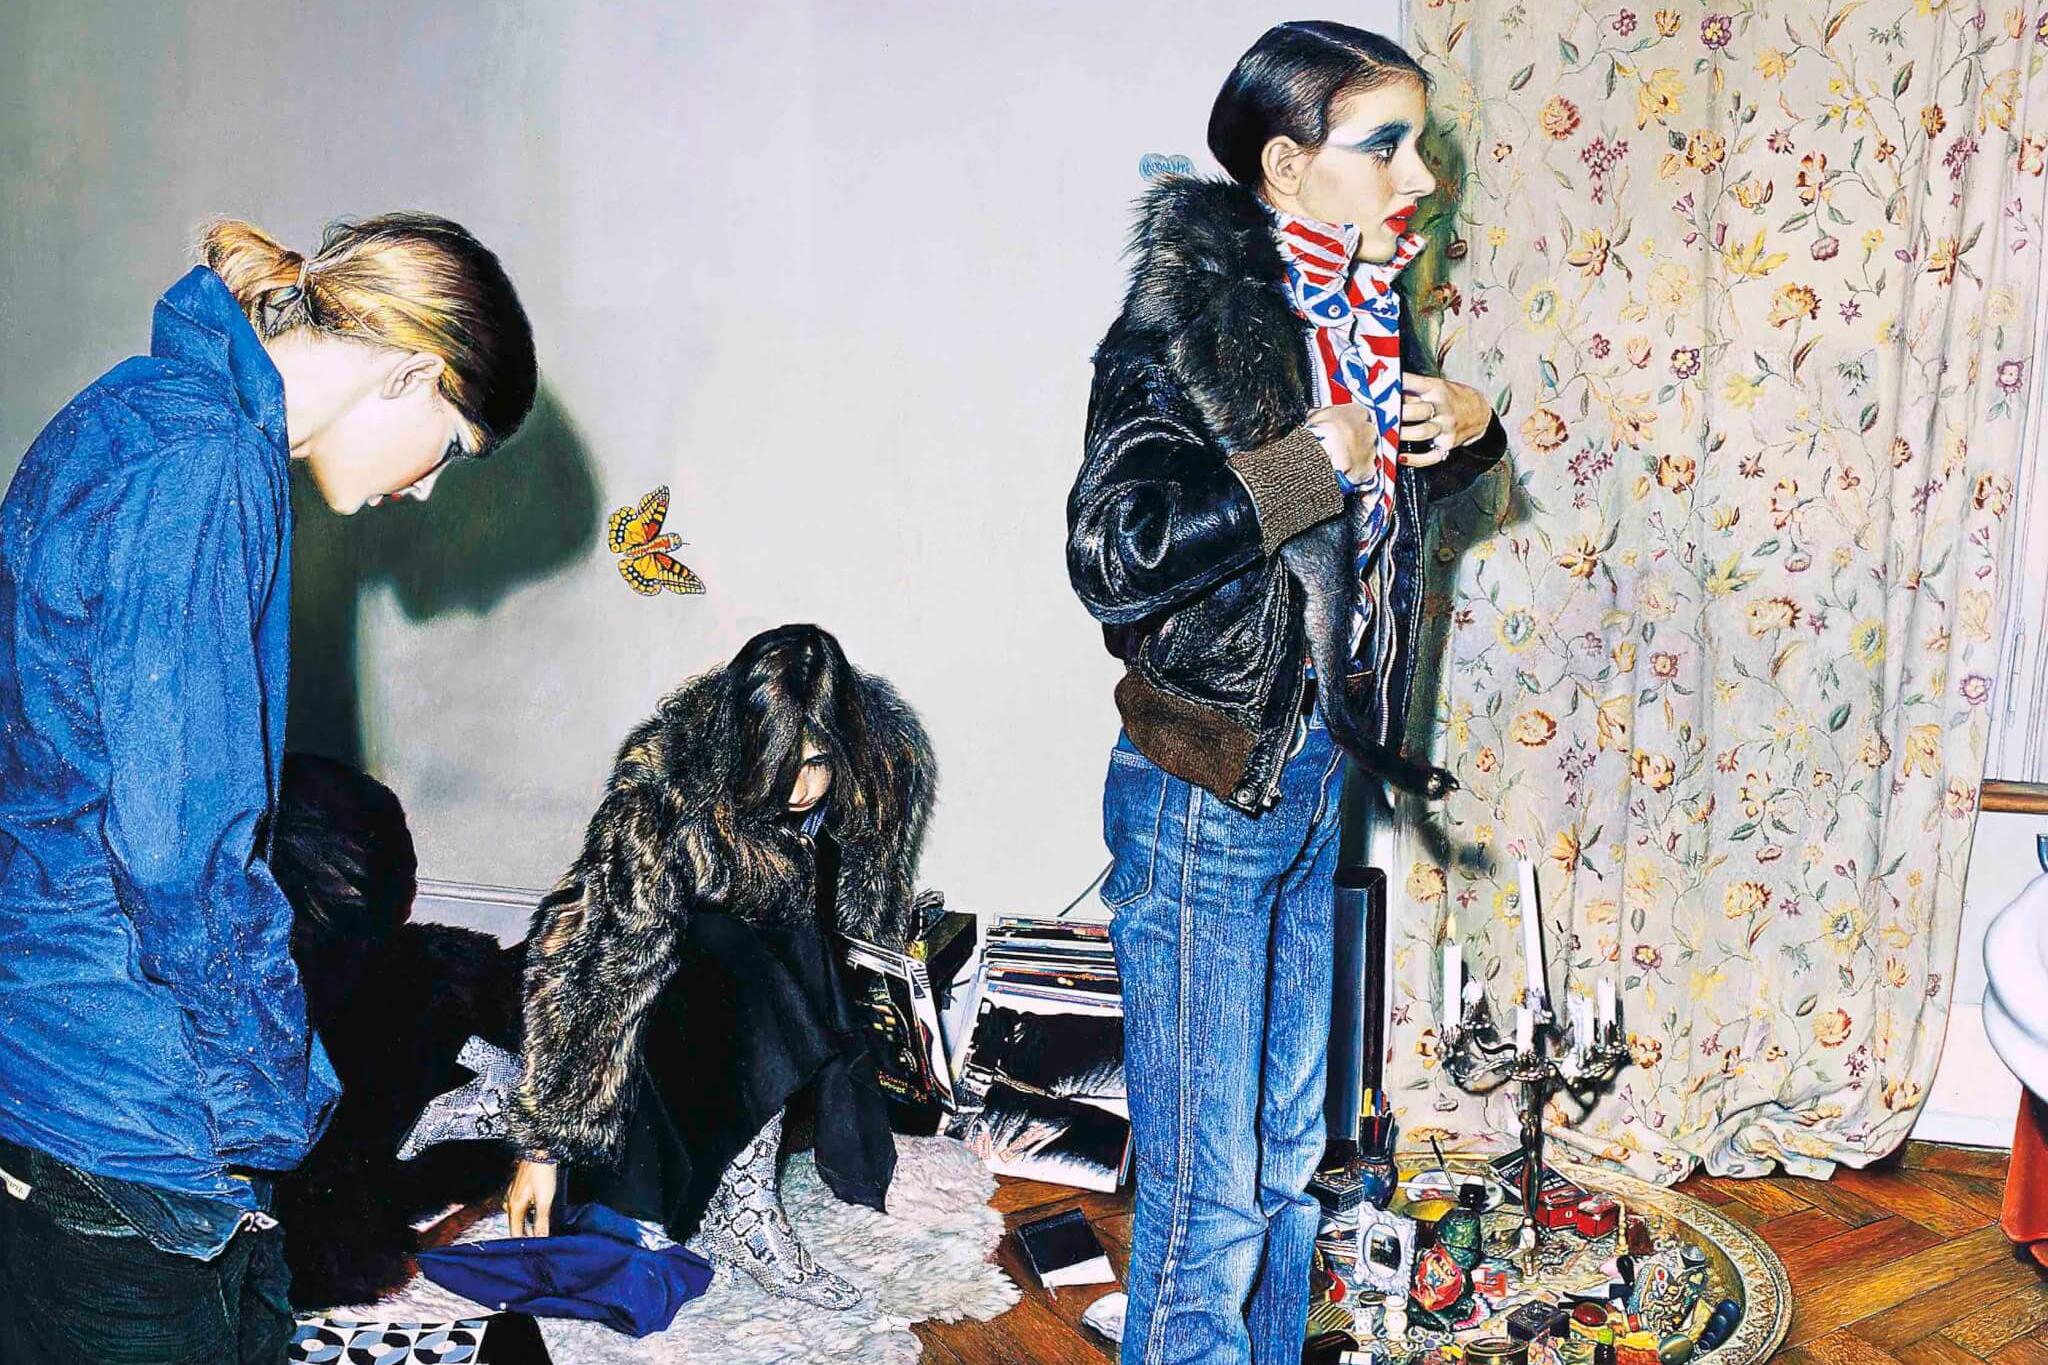 Franz Gertsch, At Luciano's House, 1973